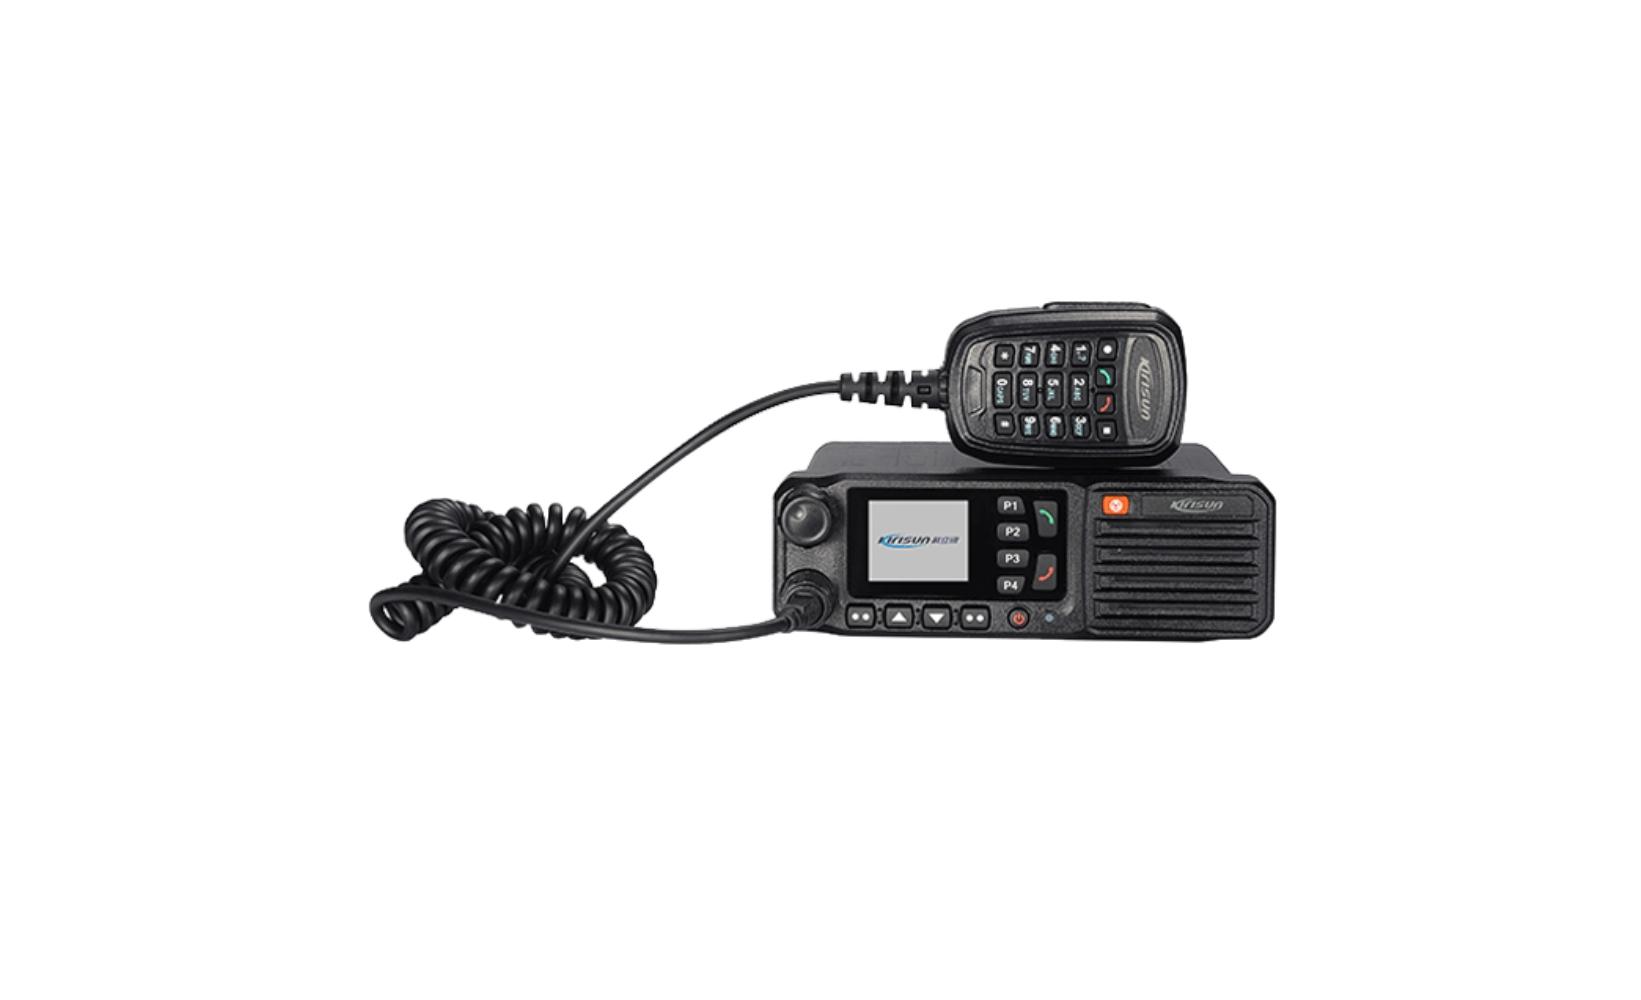 photo of TM-840-VHF-25 - 1024 Channel, 25 Watt, VHF Mobile Radio